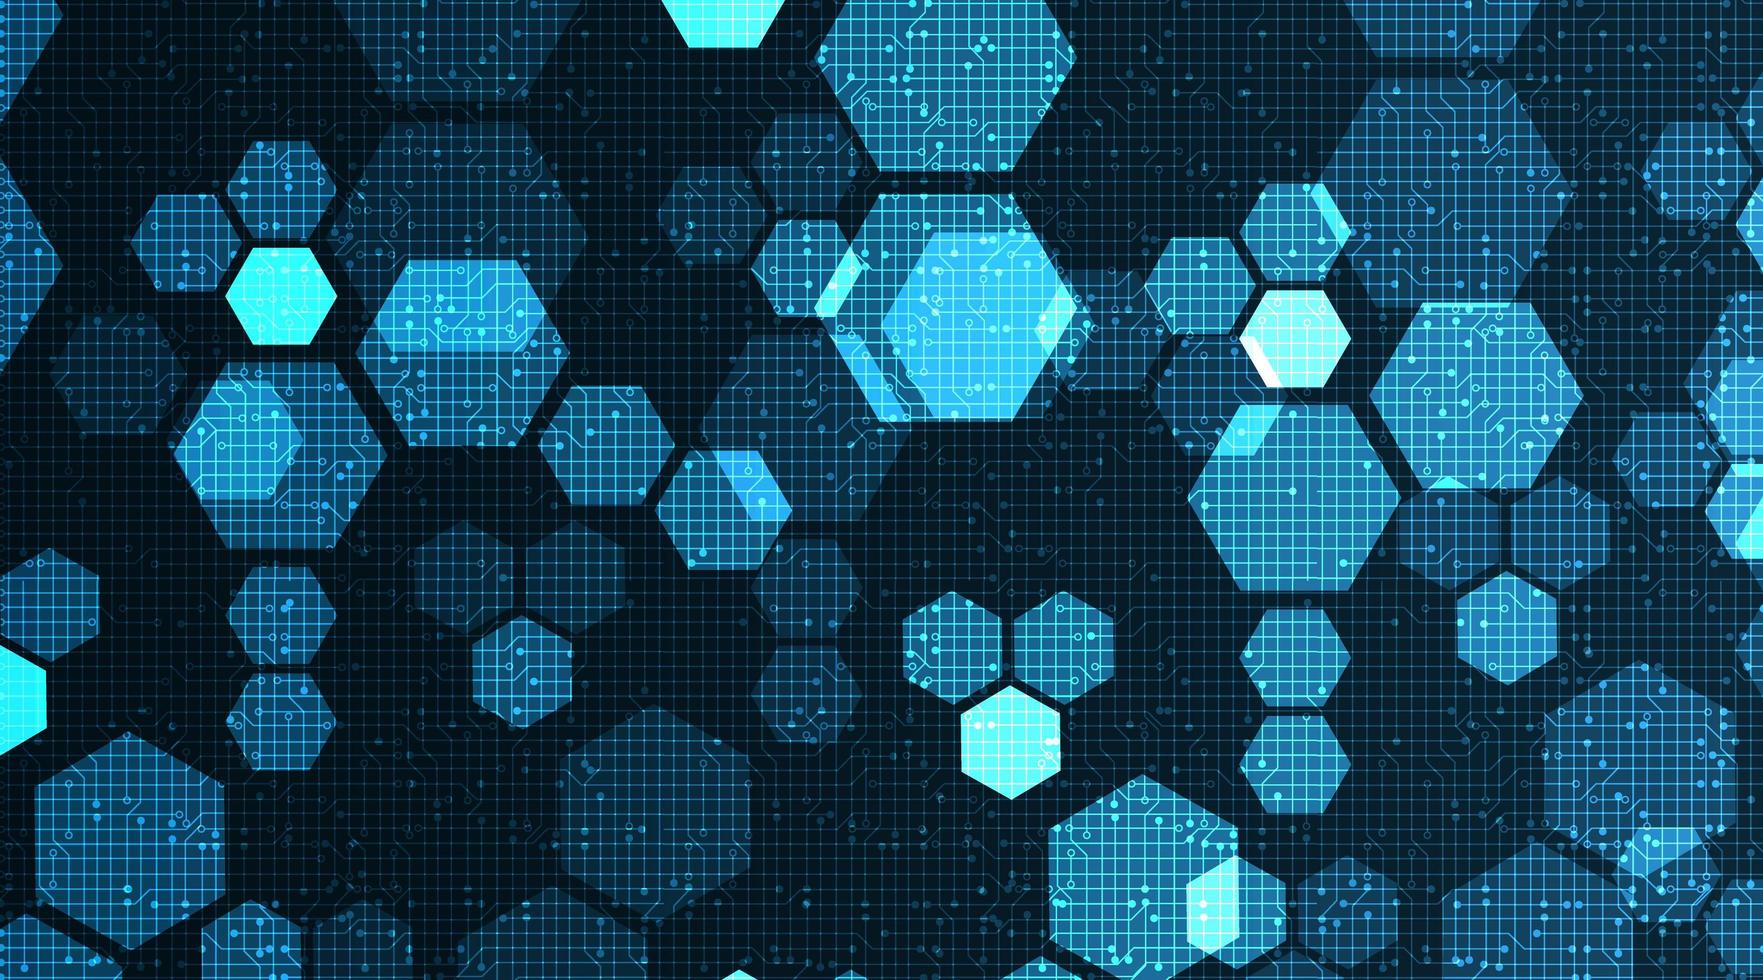 Digital polygonteknologi på kretsmikrochipbakgrund. vektor